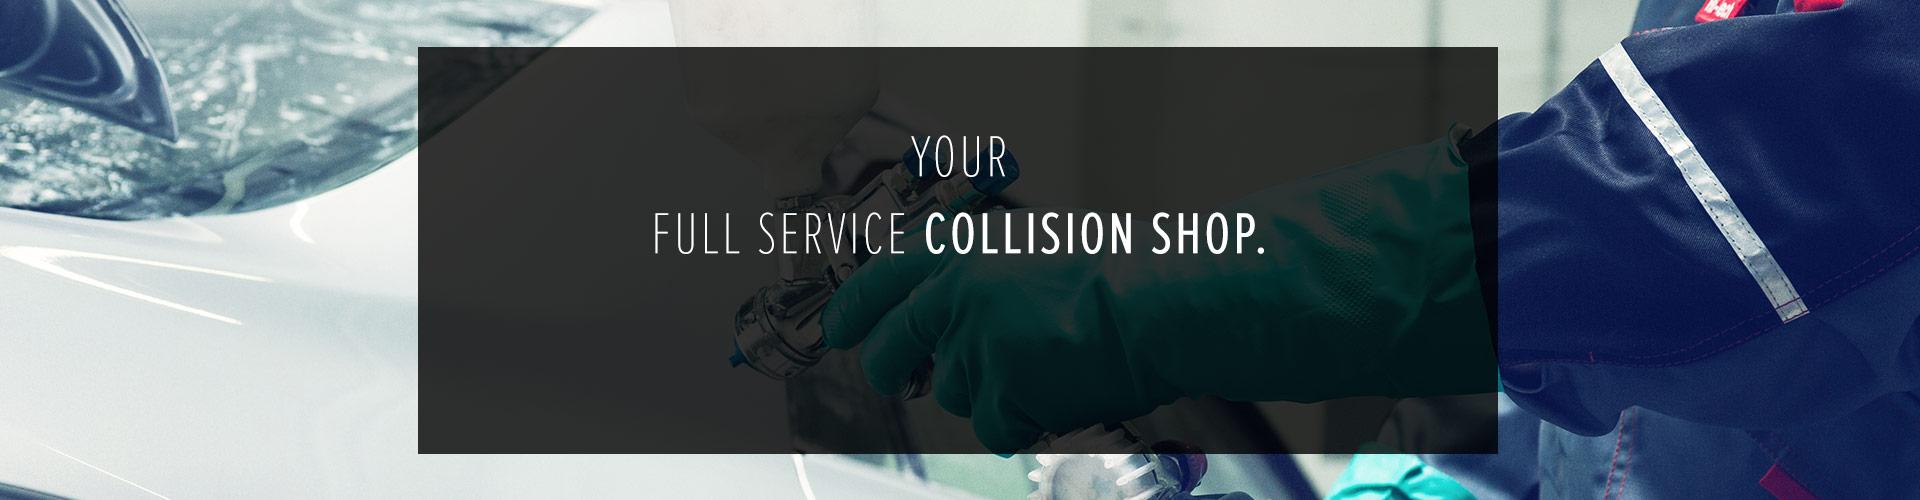 Auto Body Repair Shop in Colorado Springs, CO   Dent Repair